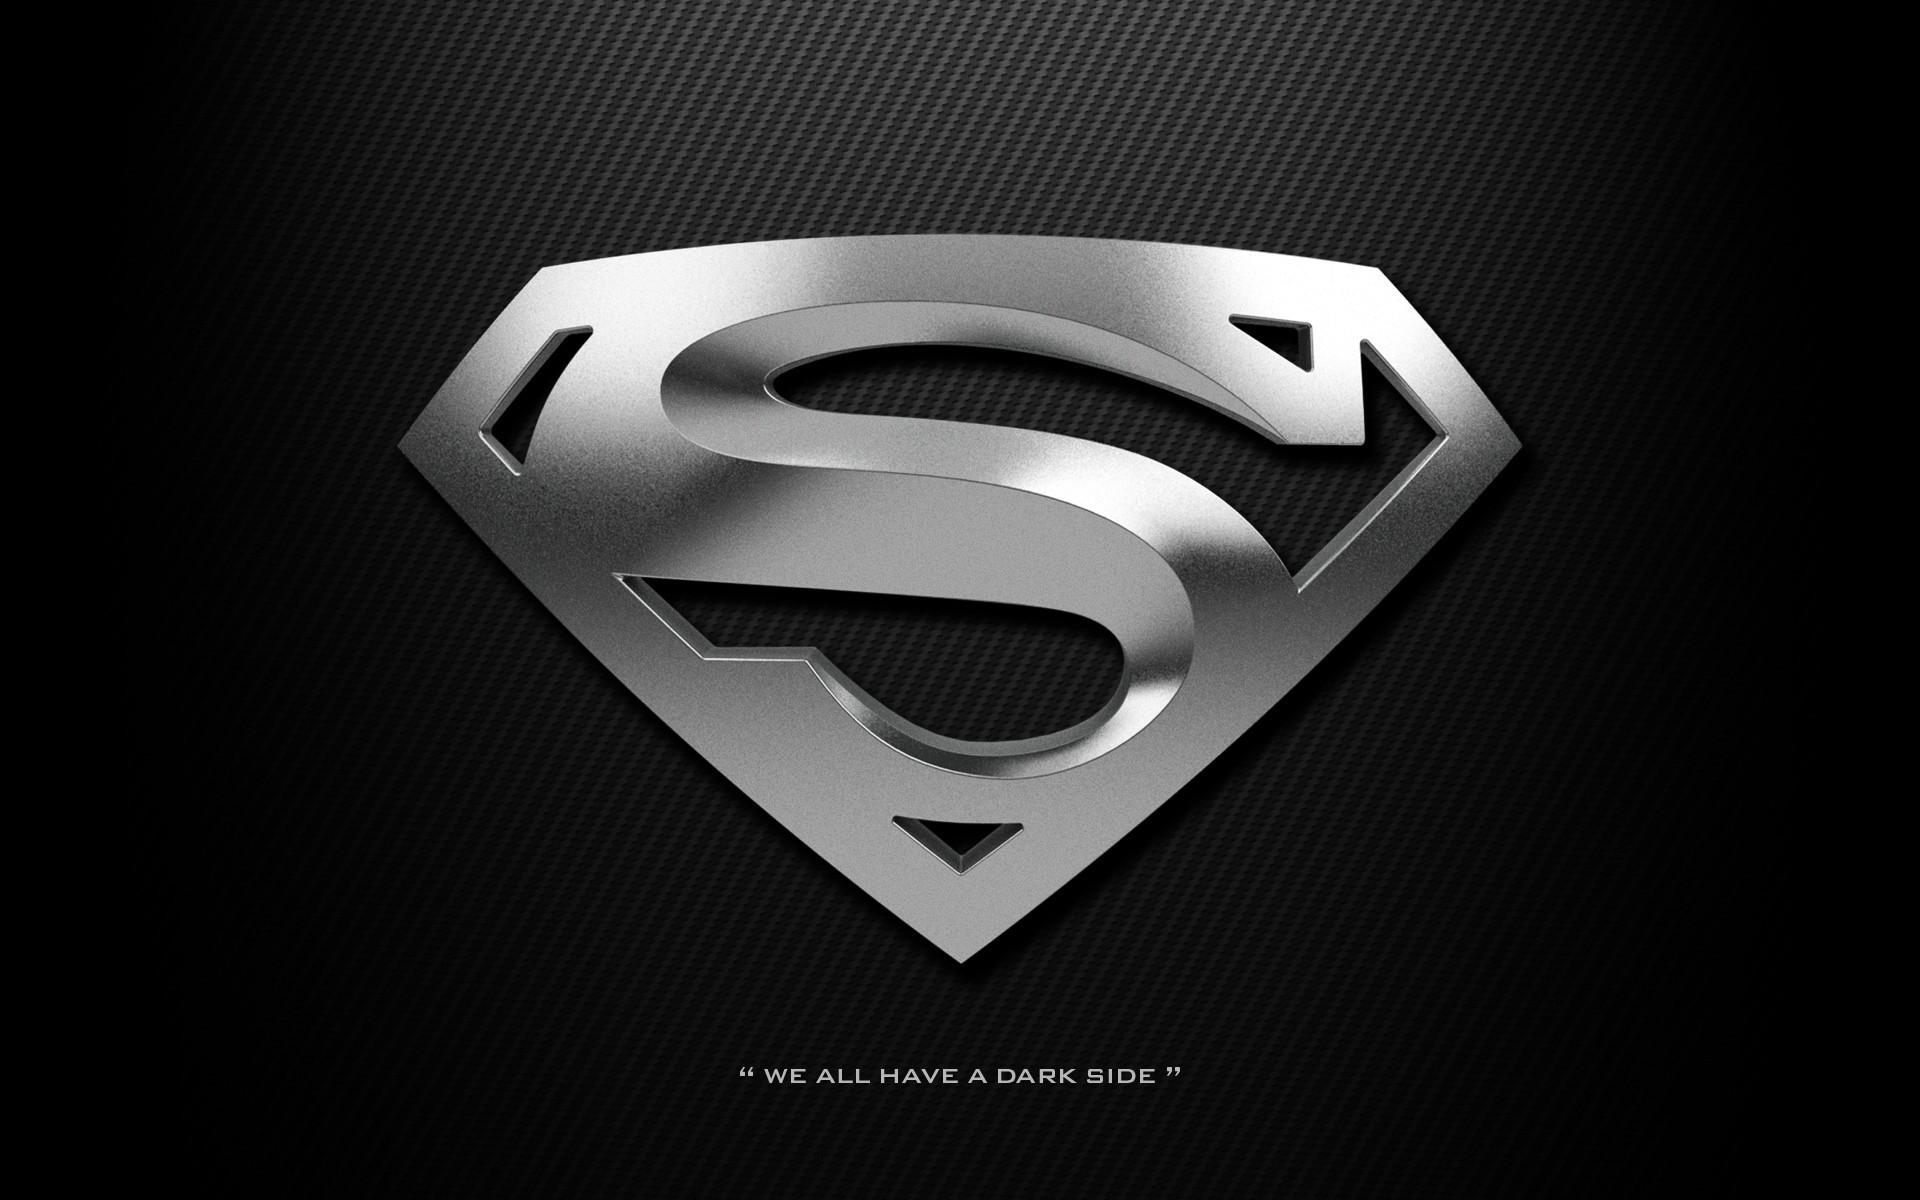 Man of Steel logo wallpaper   1024245 1920x1200